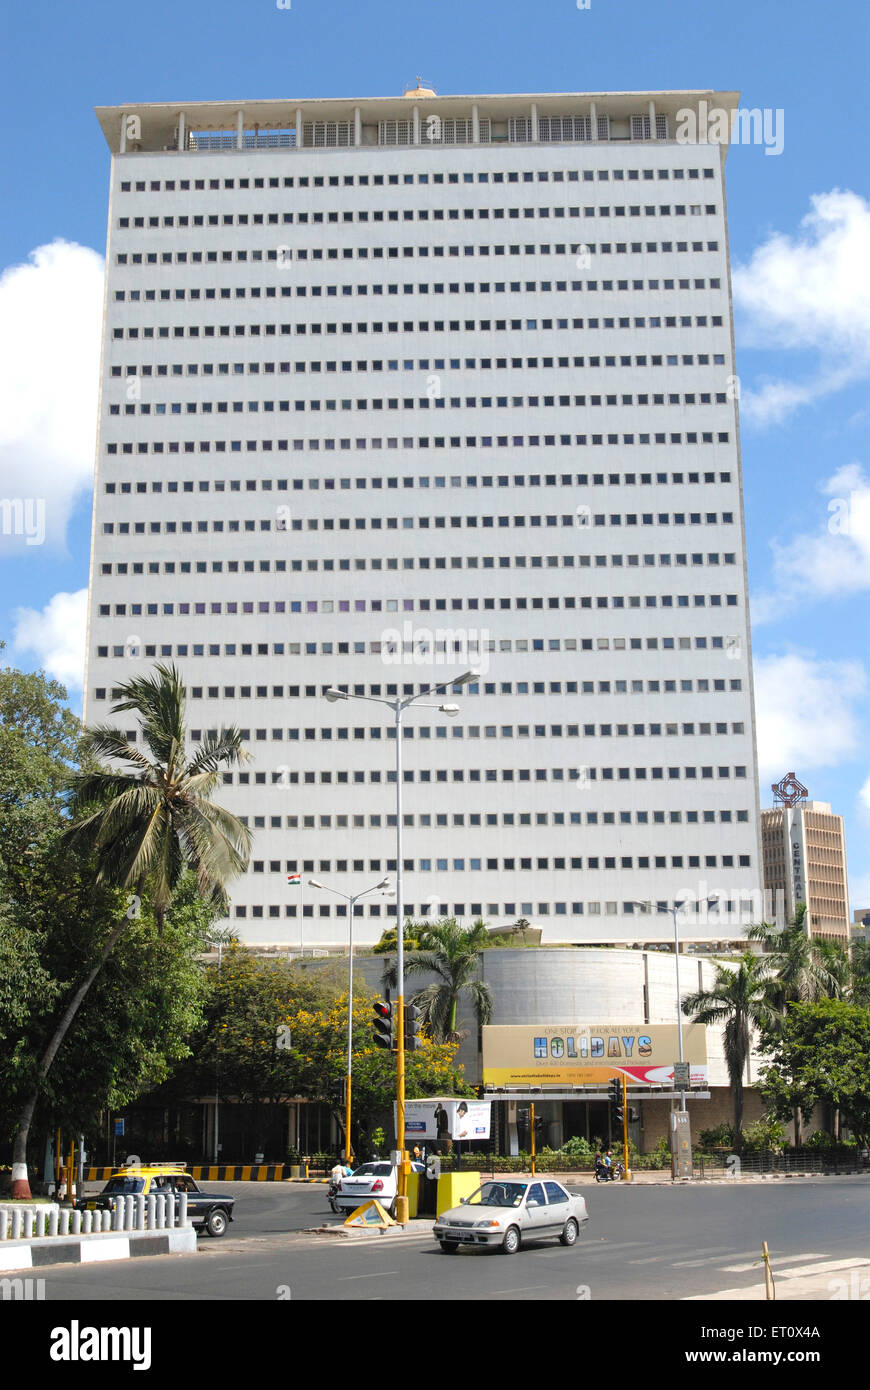 Commercial building design commercial building subhash - Air India Building At Nariman Point Netaji Subhashchandra Bose Road Churchgate Bombay Mumbai